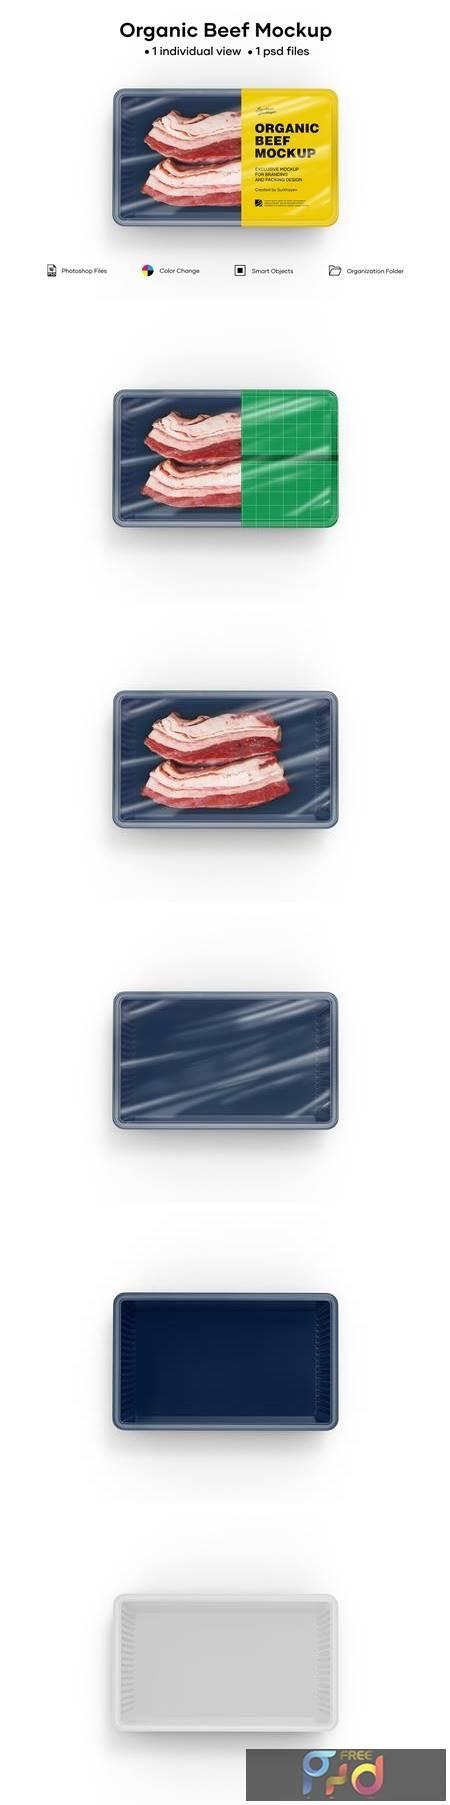 Beef Mockup 5234119 1